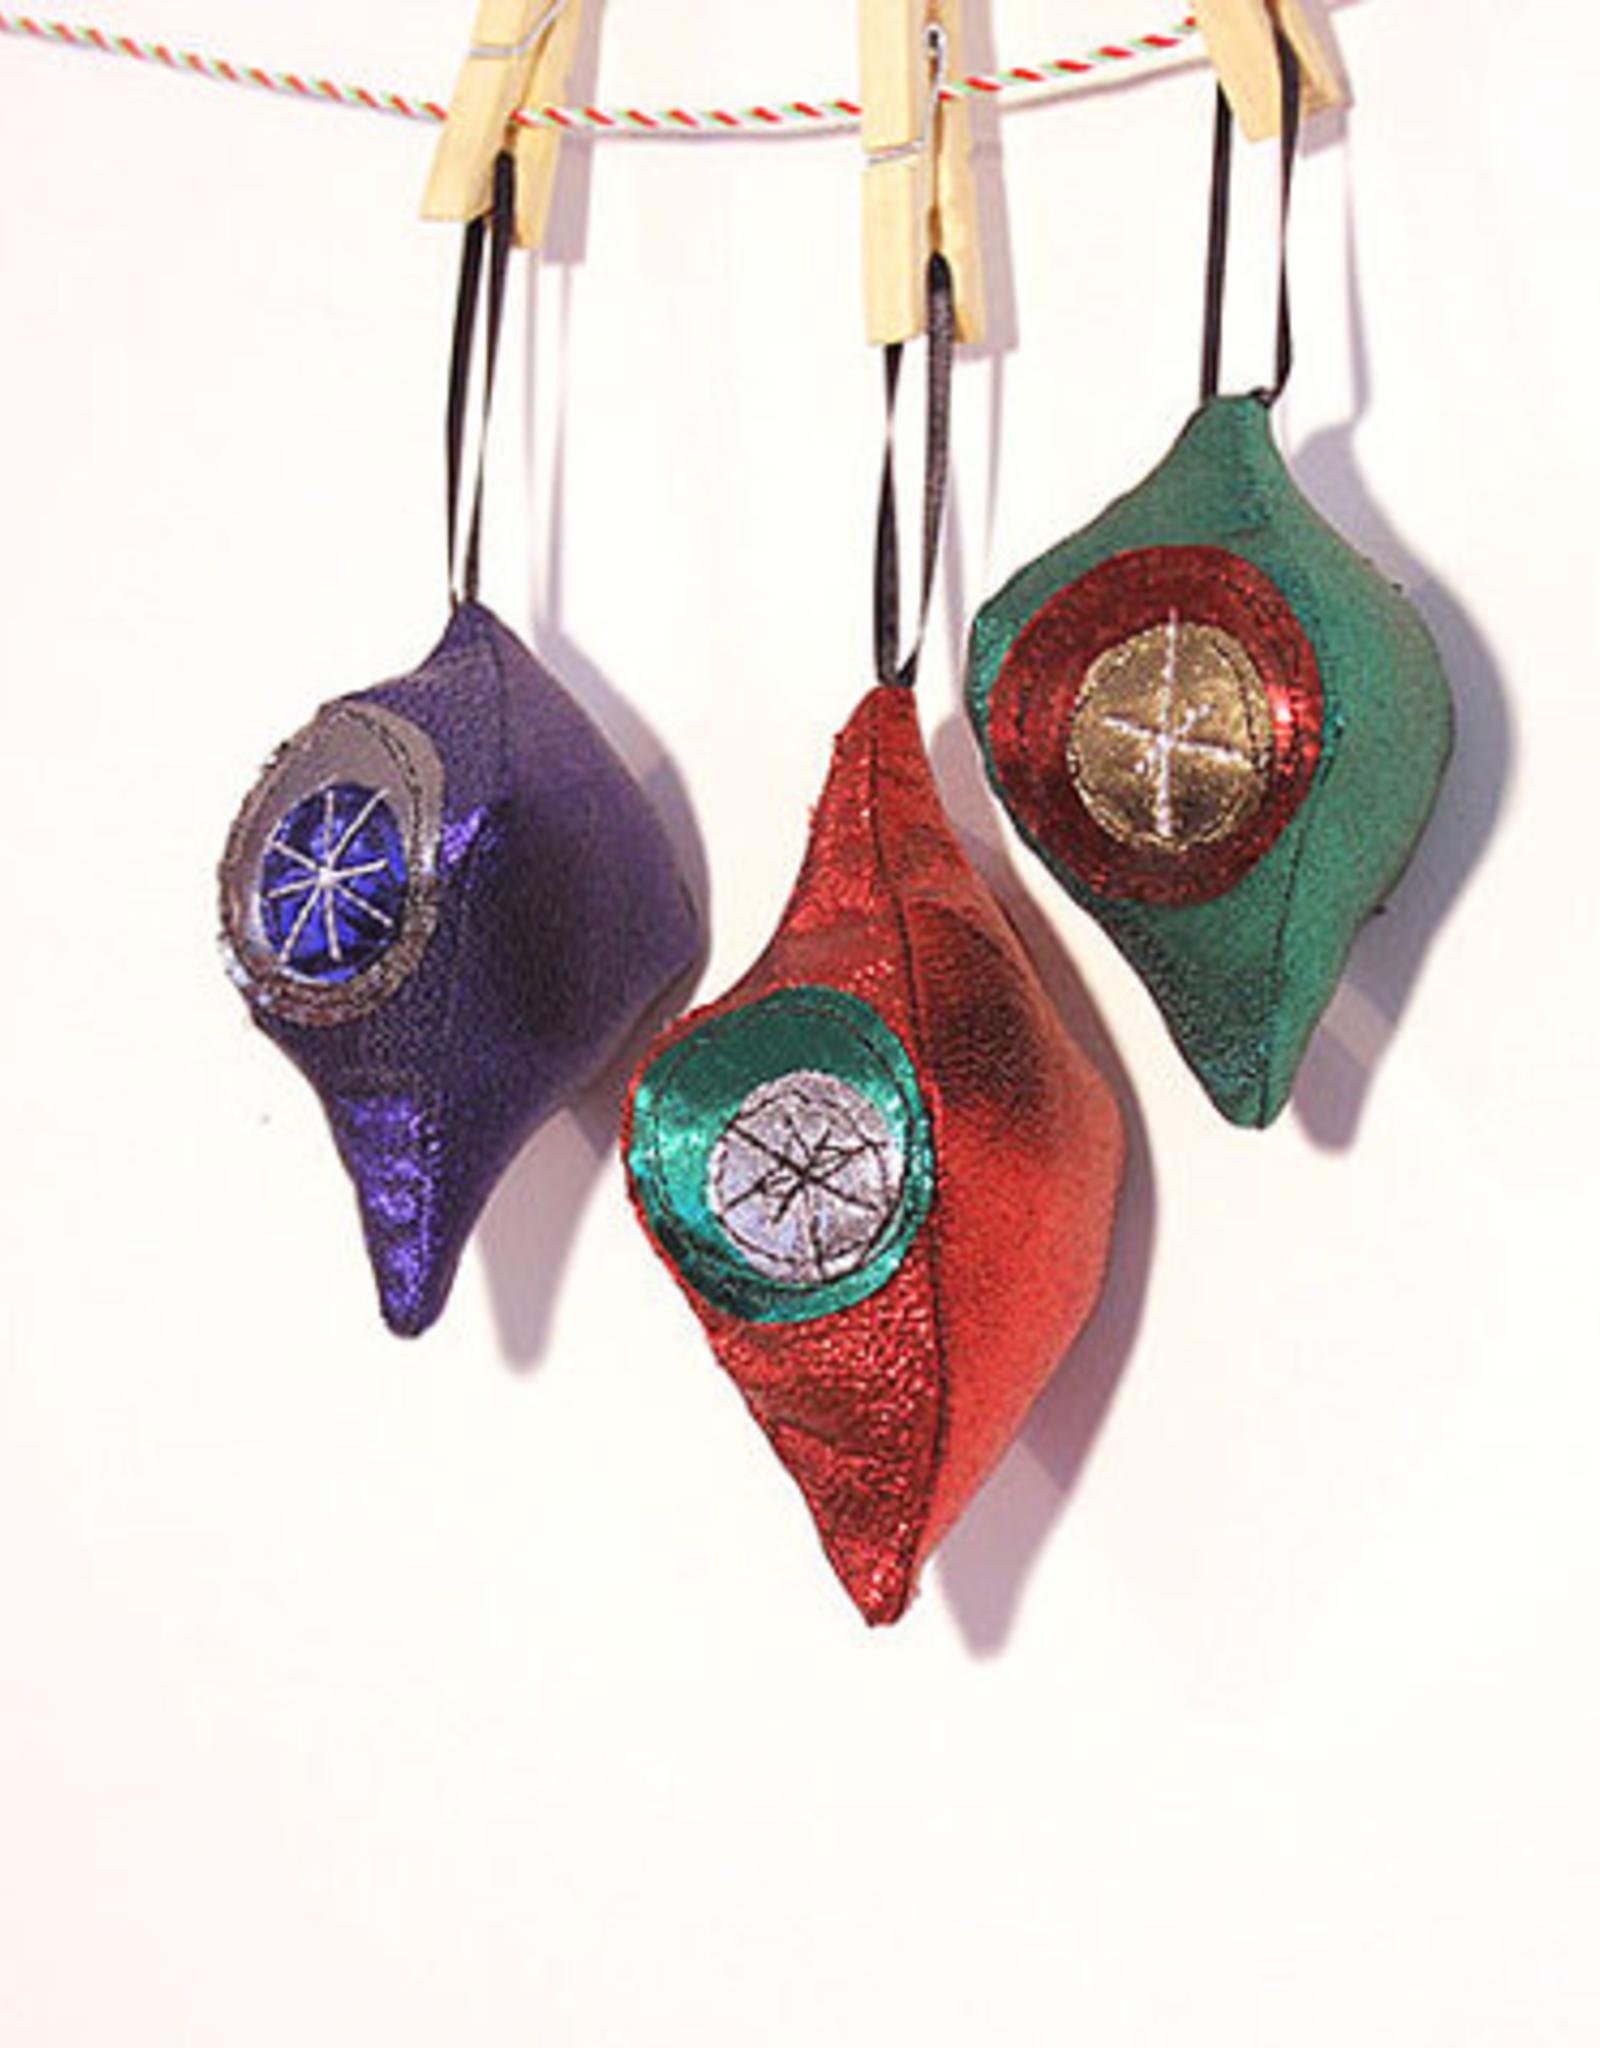 Retro Bulb Ornament Fabric Single (Assorted Designs)